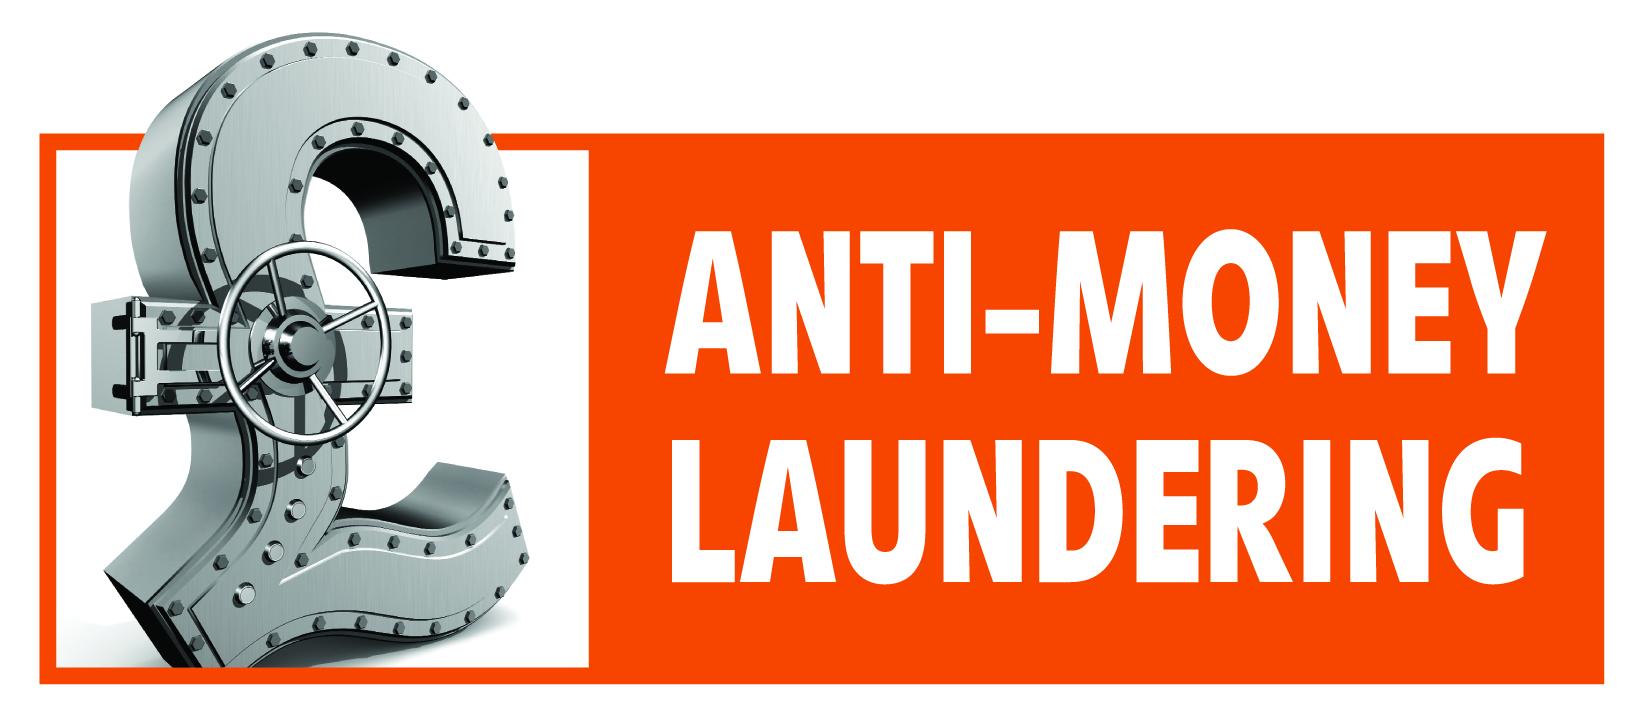 anti-money laundering software